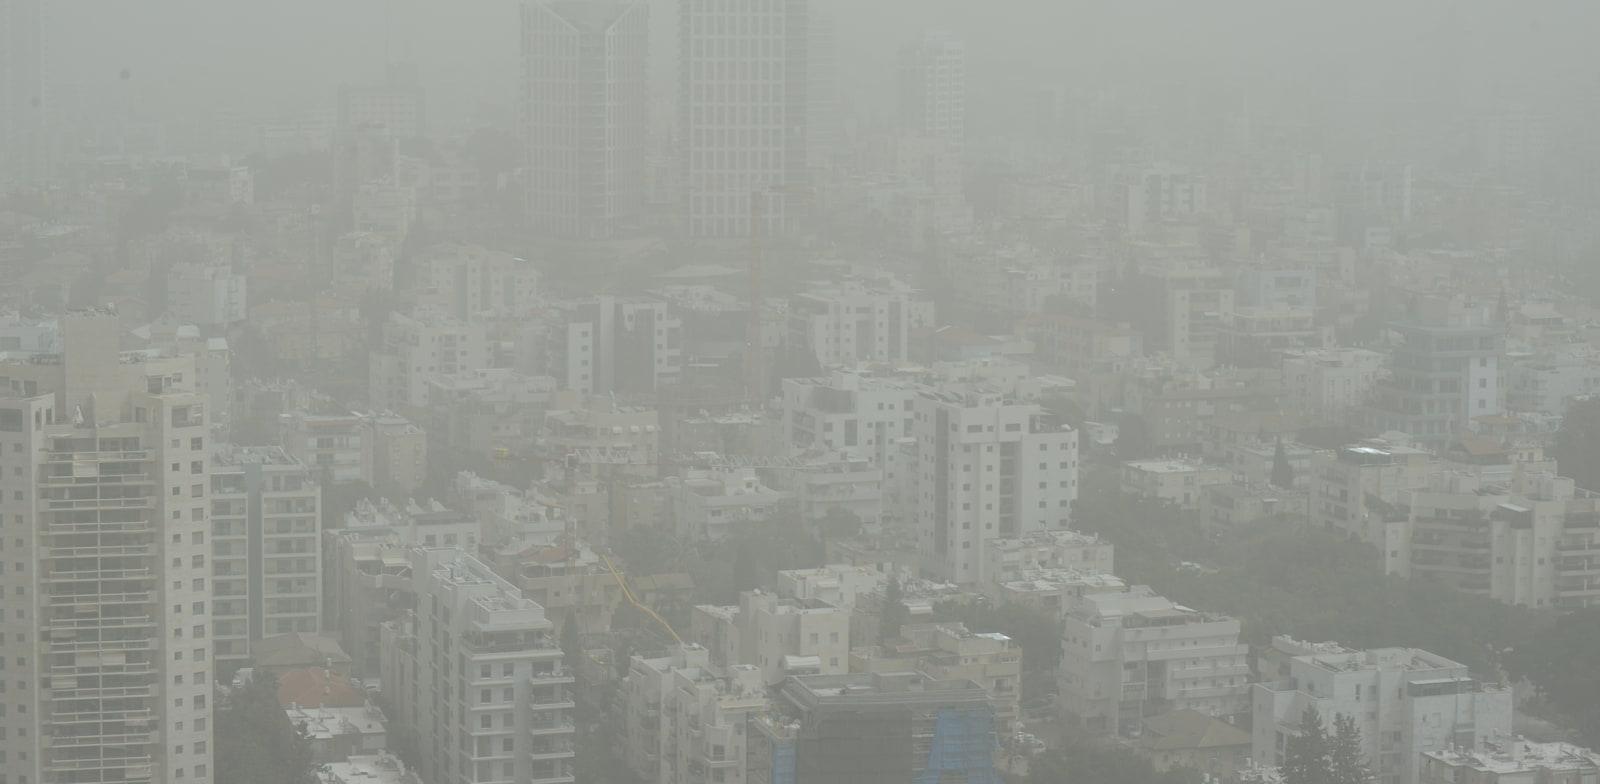 זיהום אויר ת''א / צילום: איל יצהר